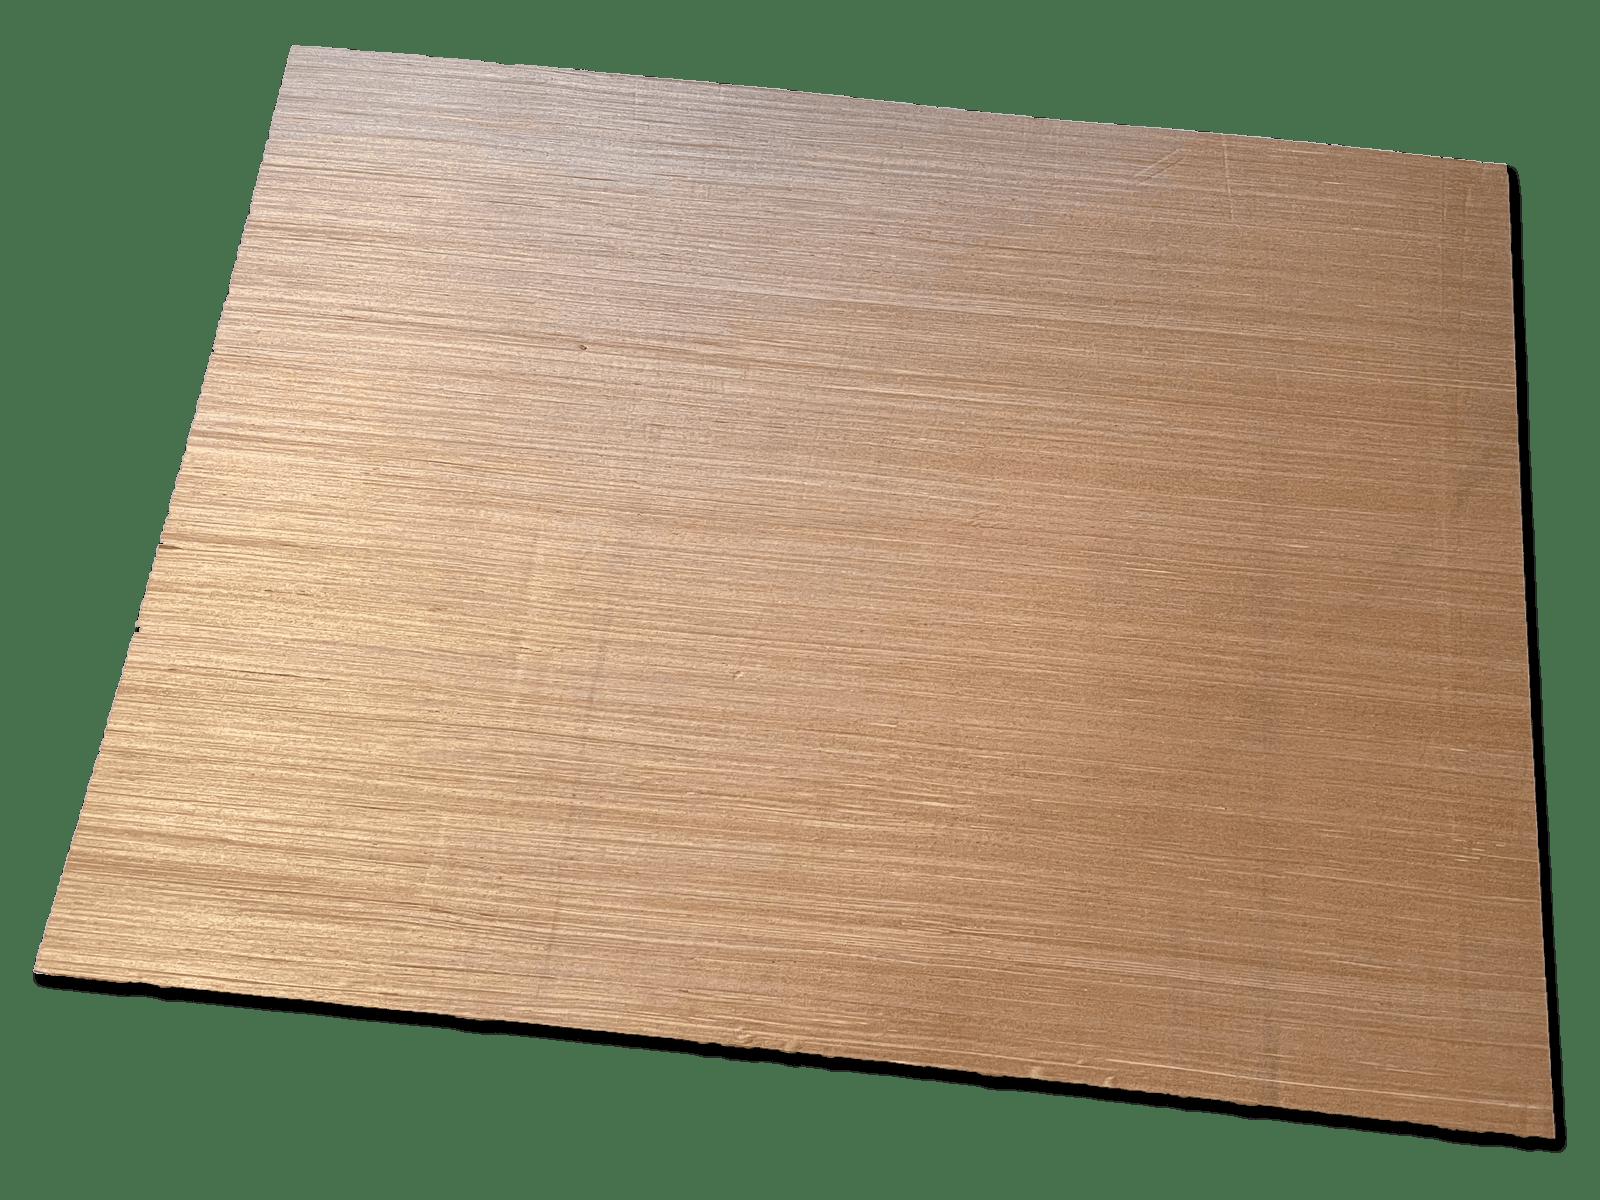 Sperrholzboden-Sperrholz-Zuschnitt